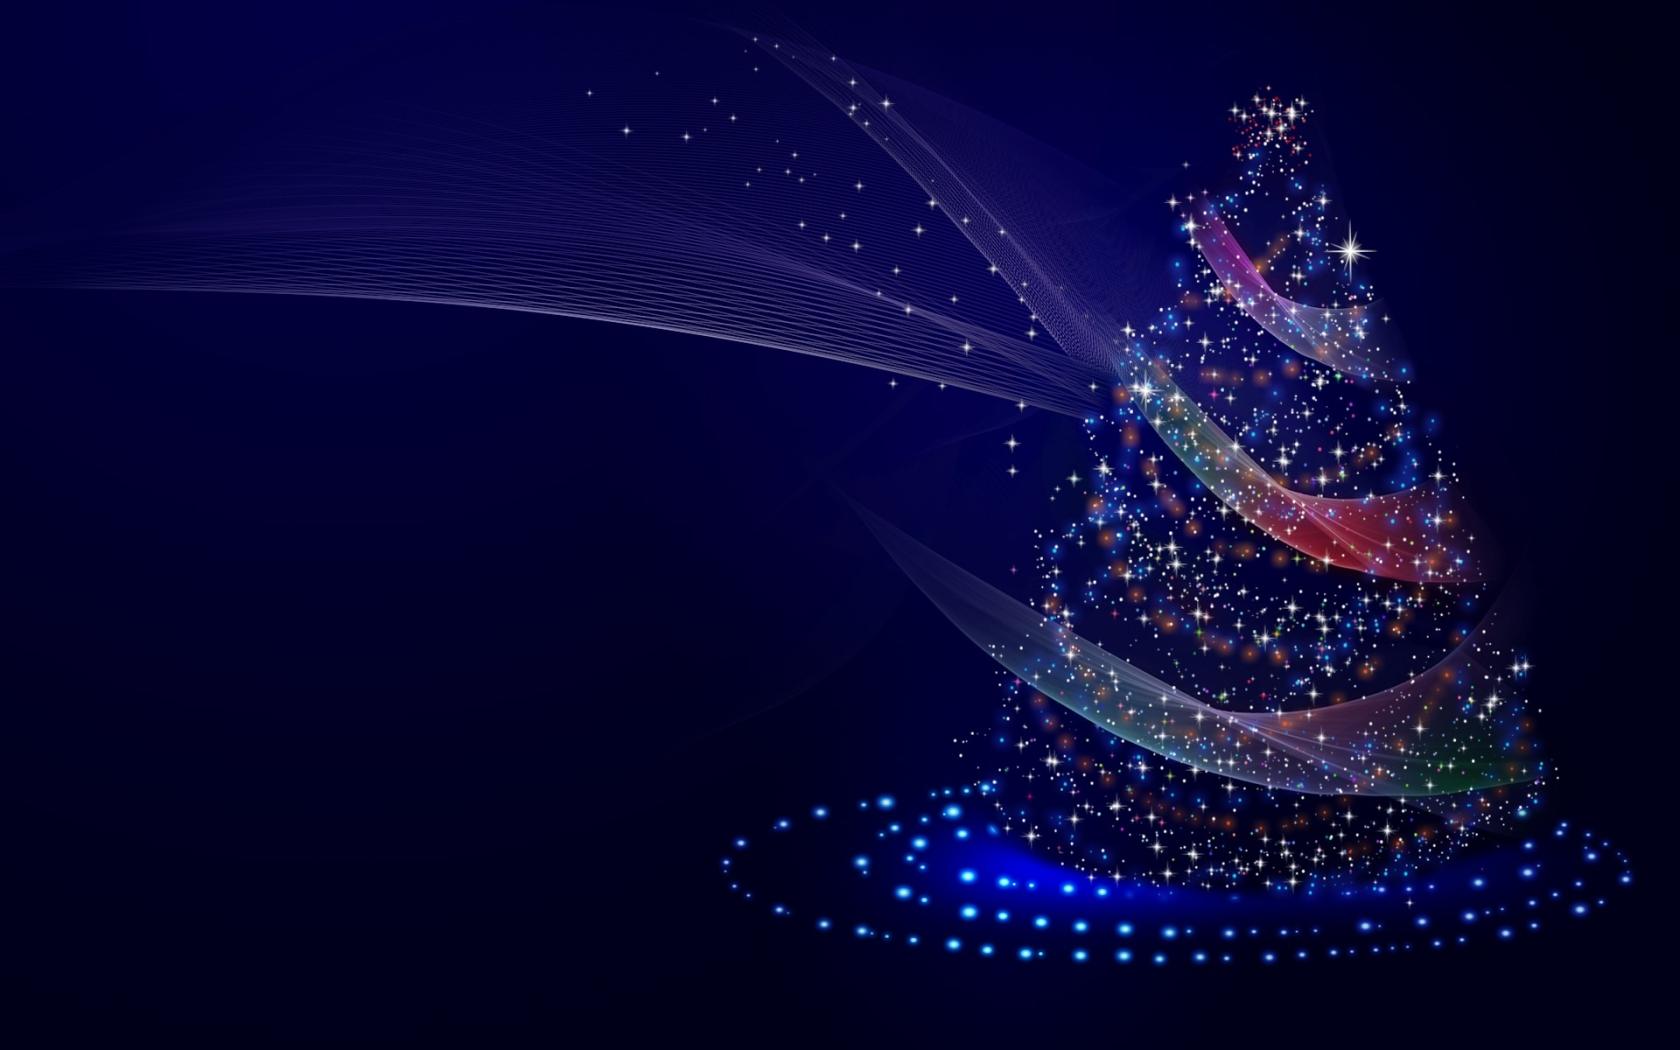 download artistic blue christmas tree 1680x1050 resolution, full hd